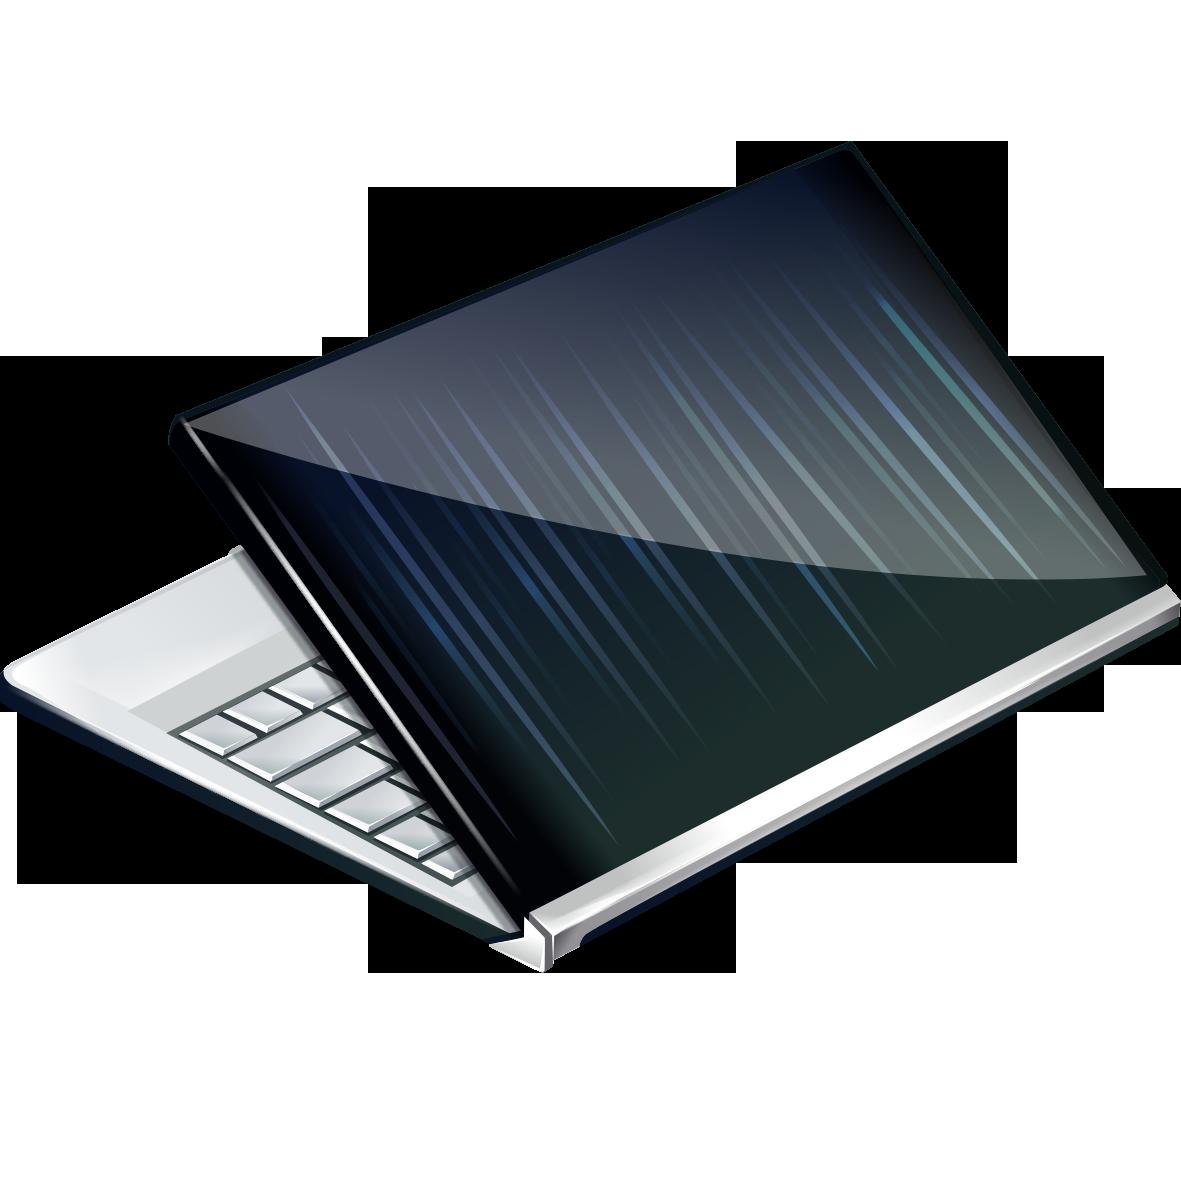 1181x1181 Laptop Drawing Euclidean Vector